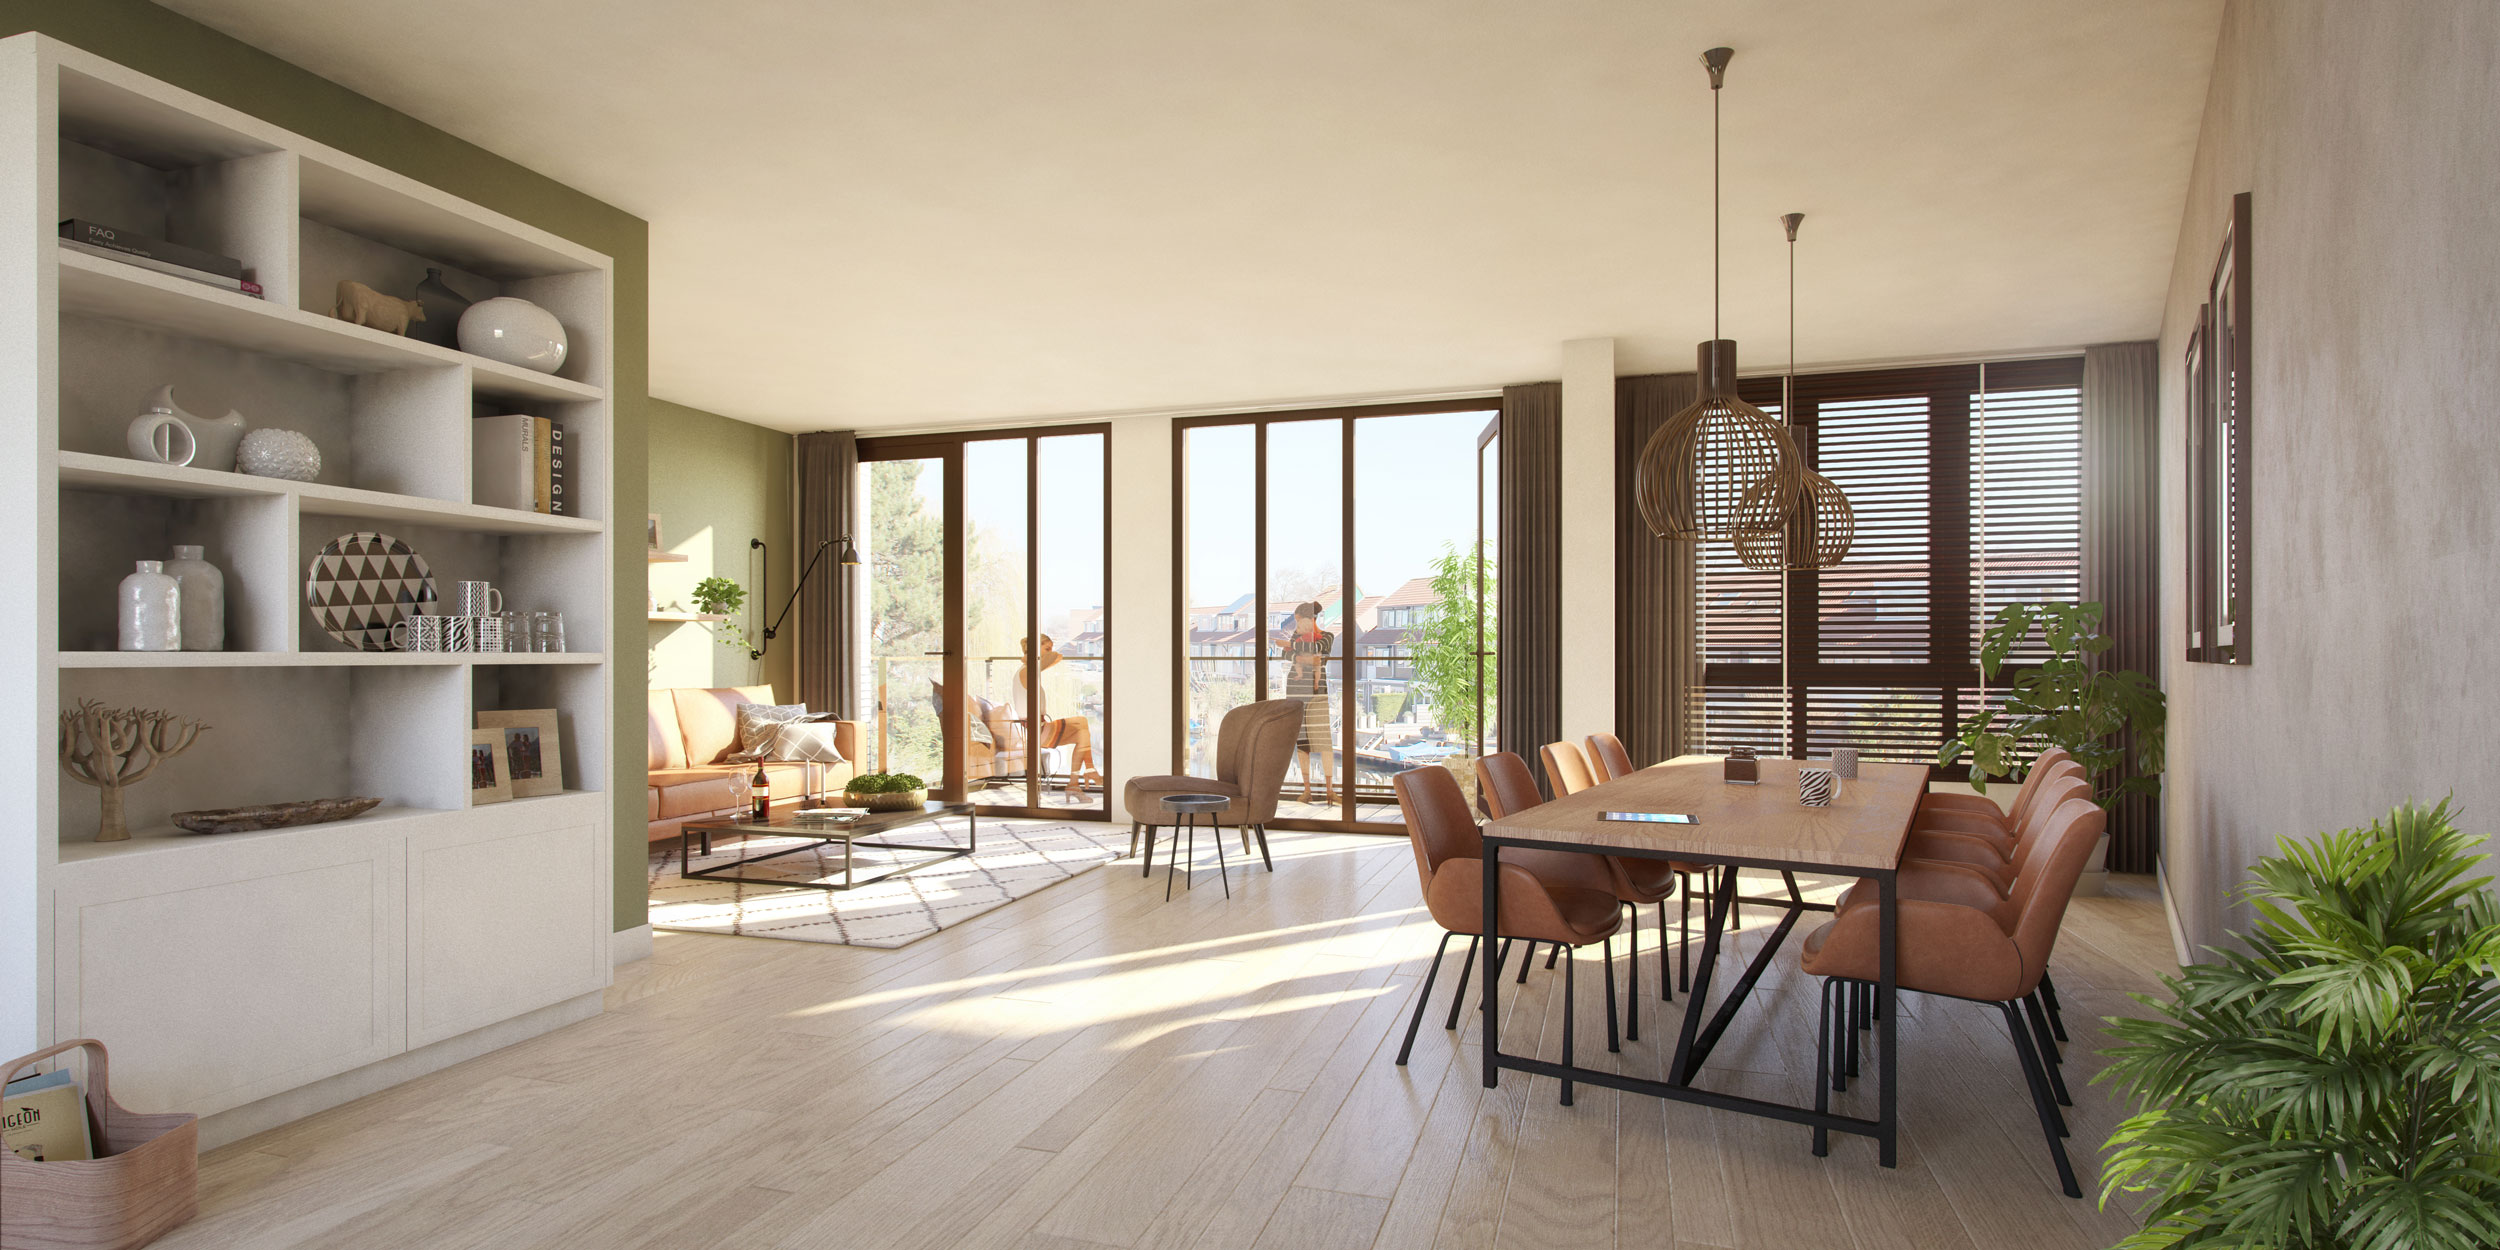 Dockside-appartementen-alkmaar-stadsvilla-header-licht